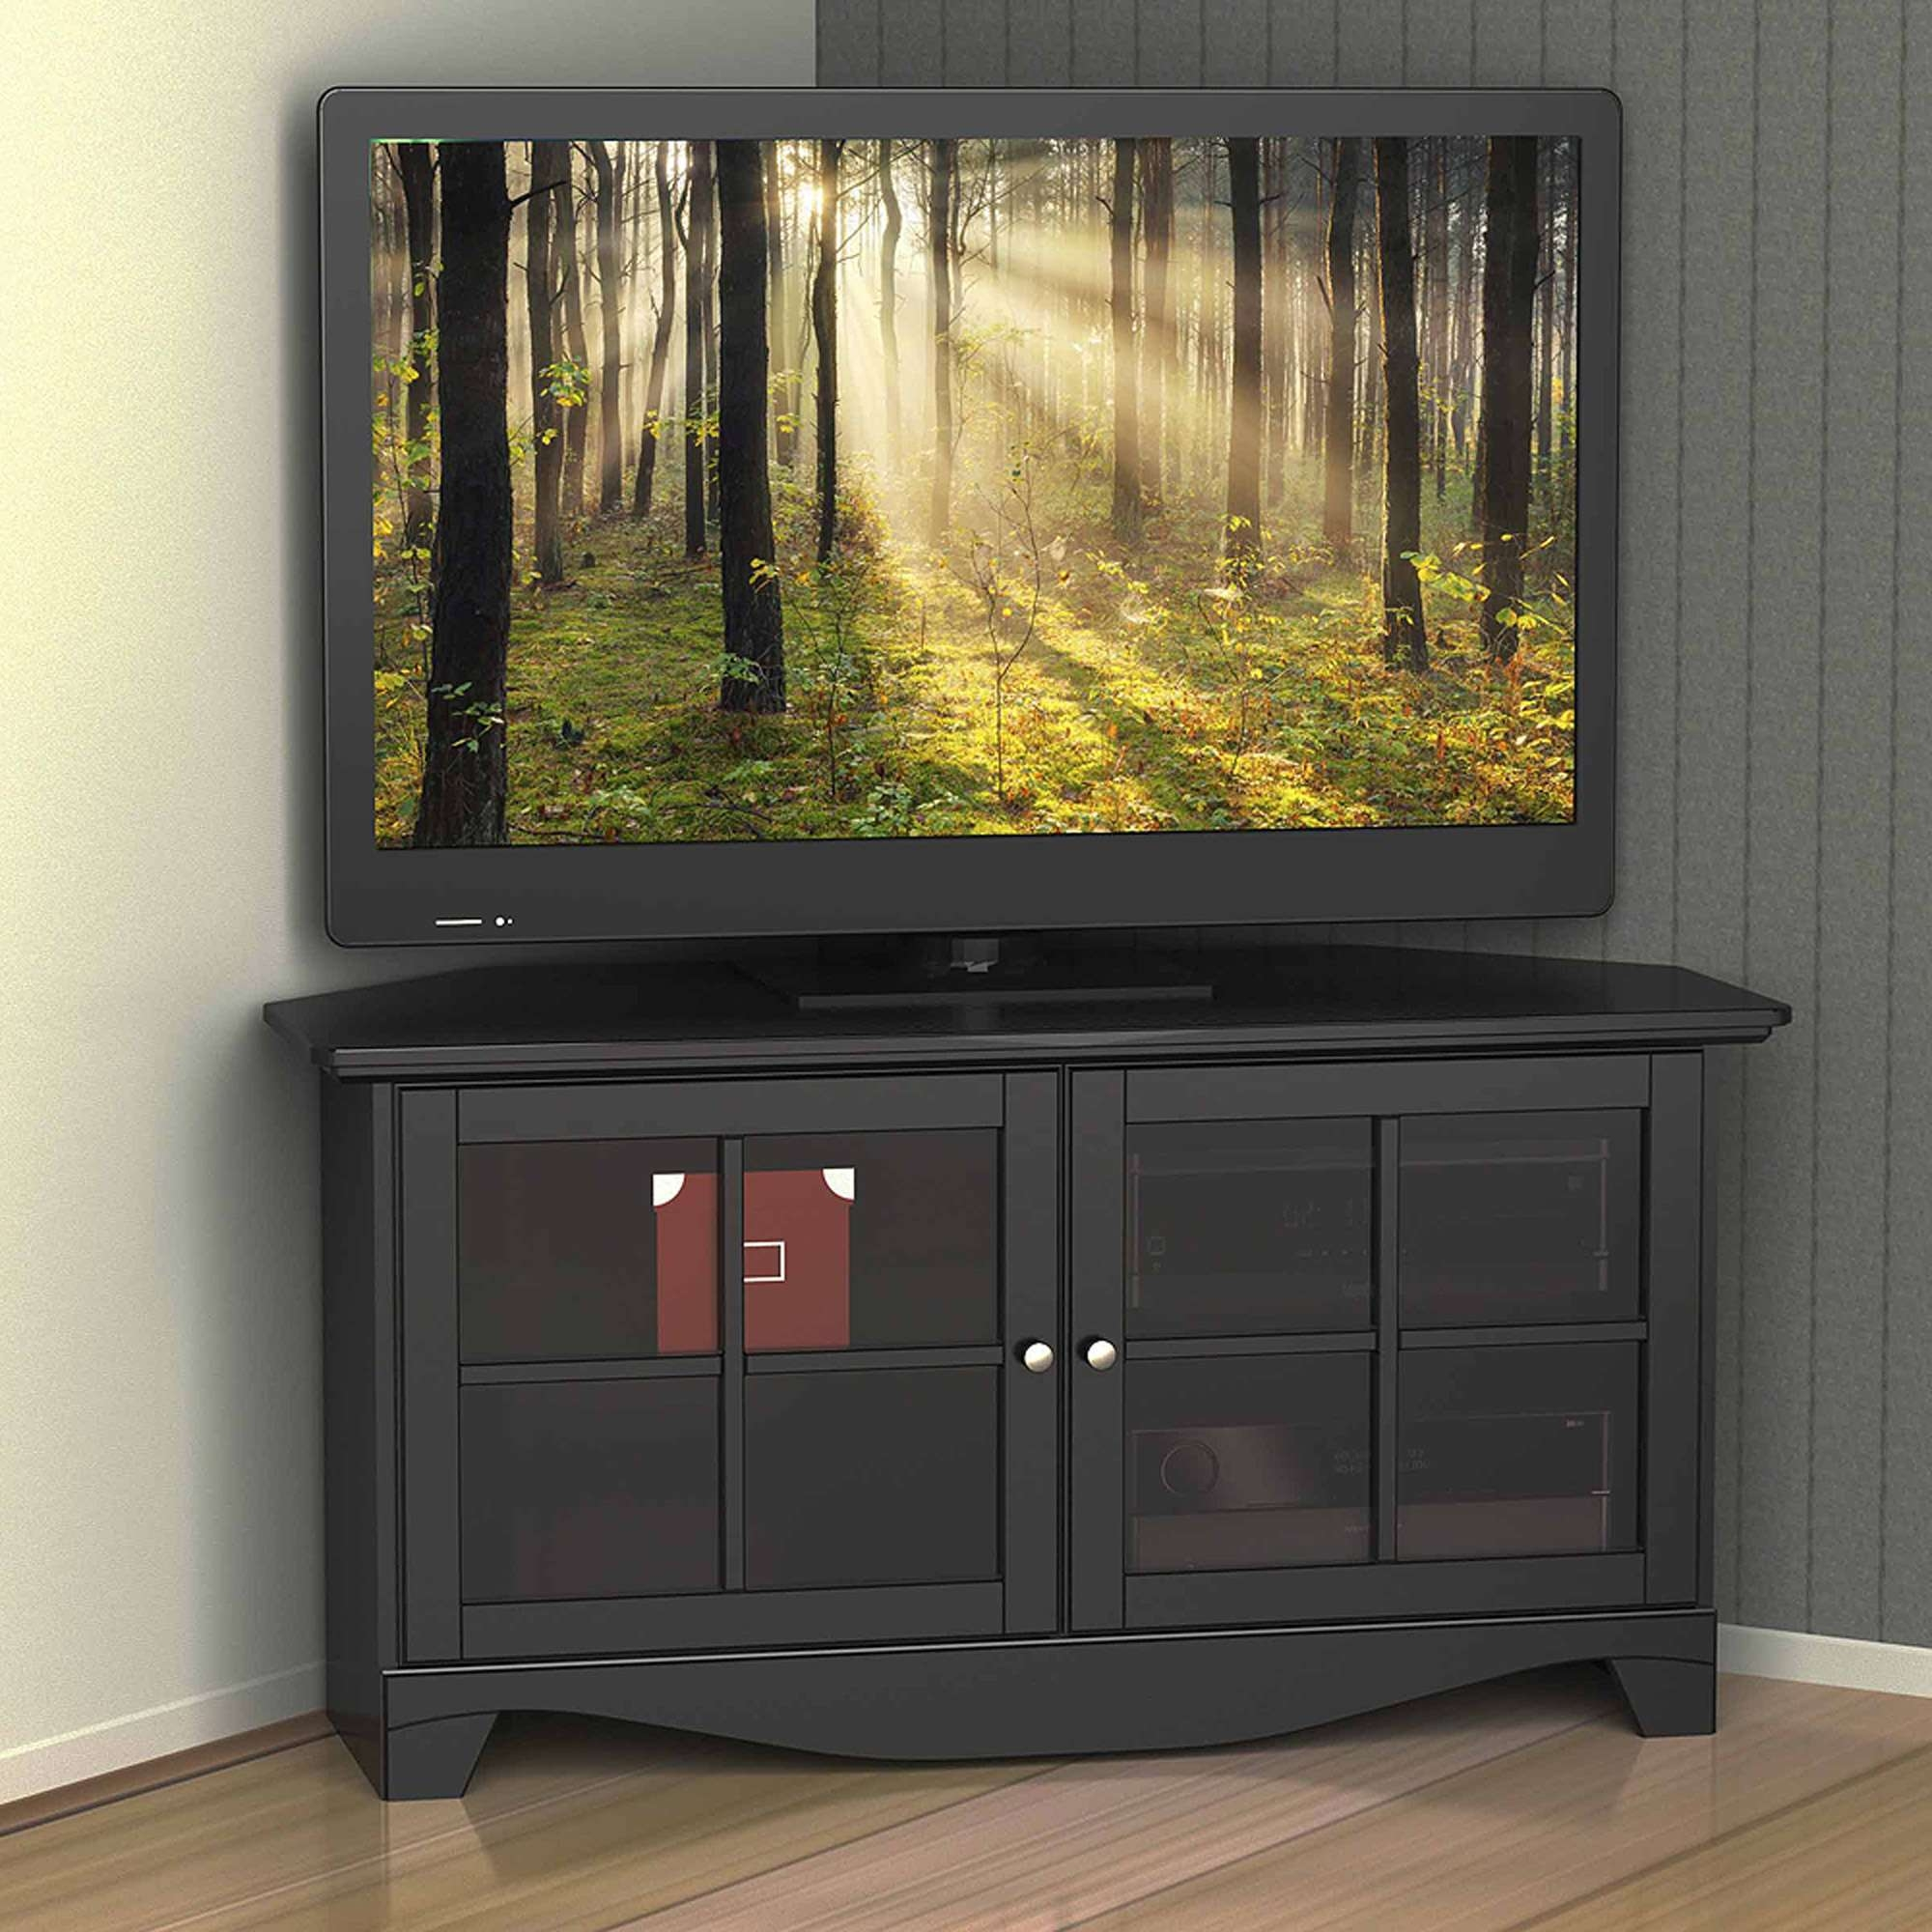 Nexera Pinnacle Black 2 Door Corner Tv Stand For Tvs Up To 49 For Corner Tv Stands (View 8 of 15)